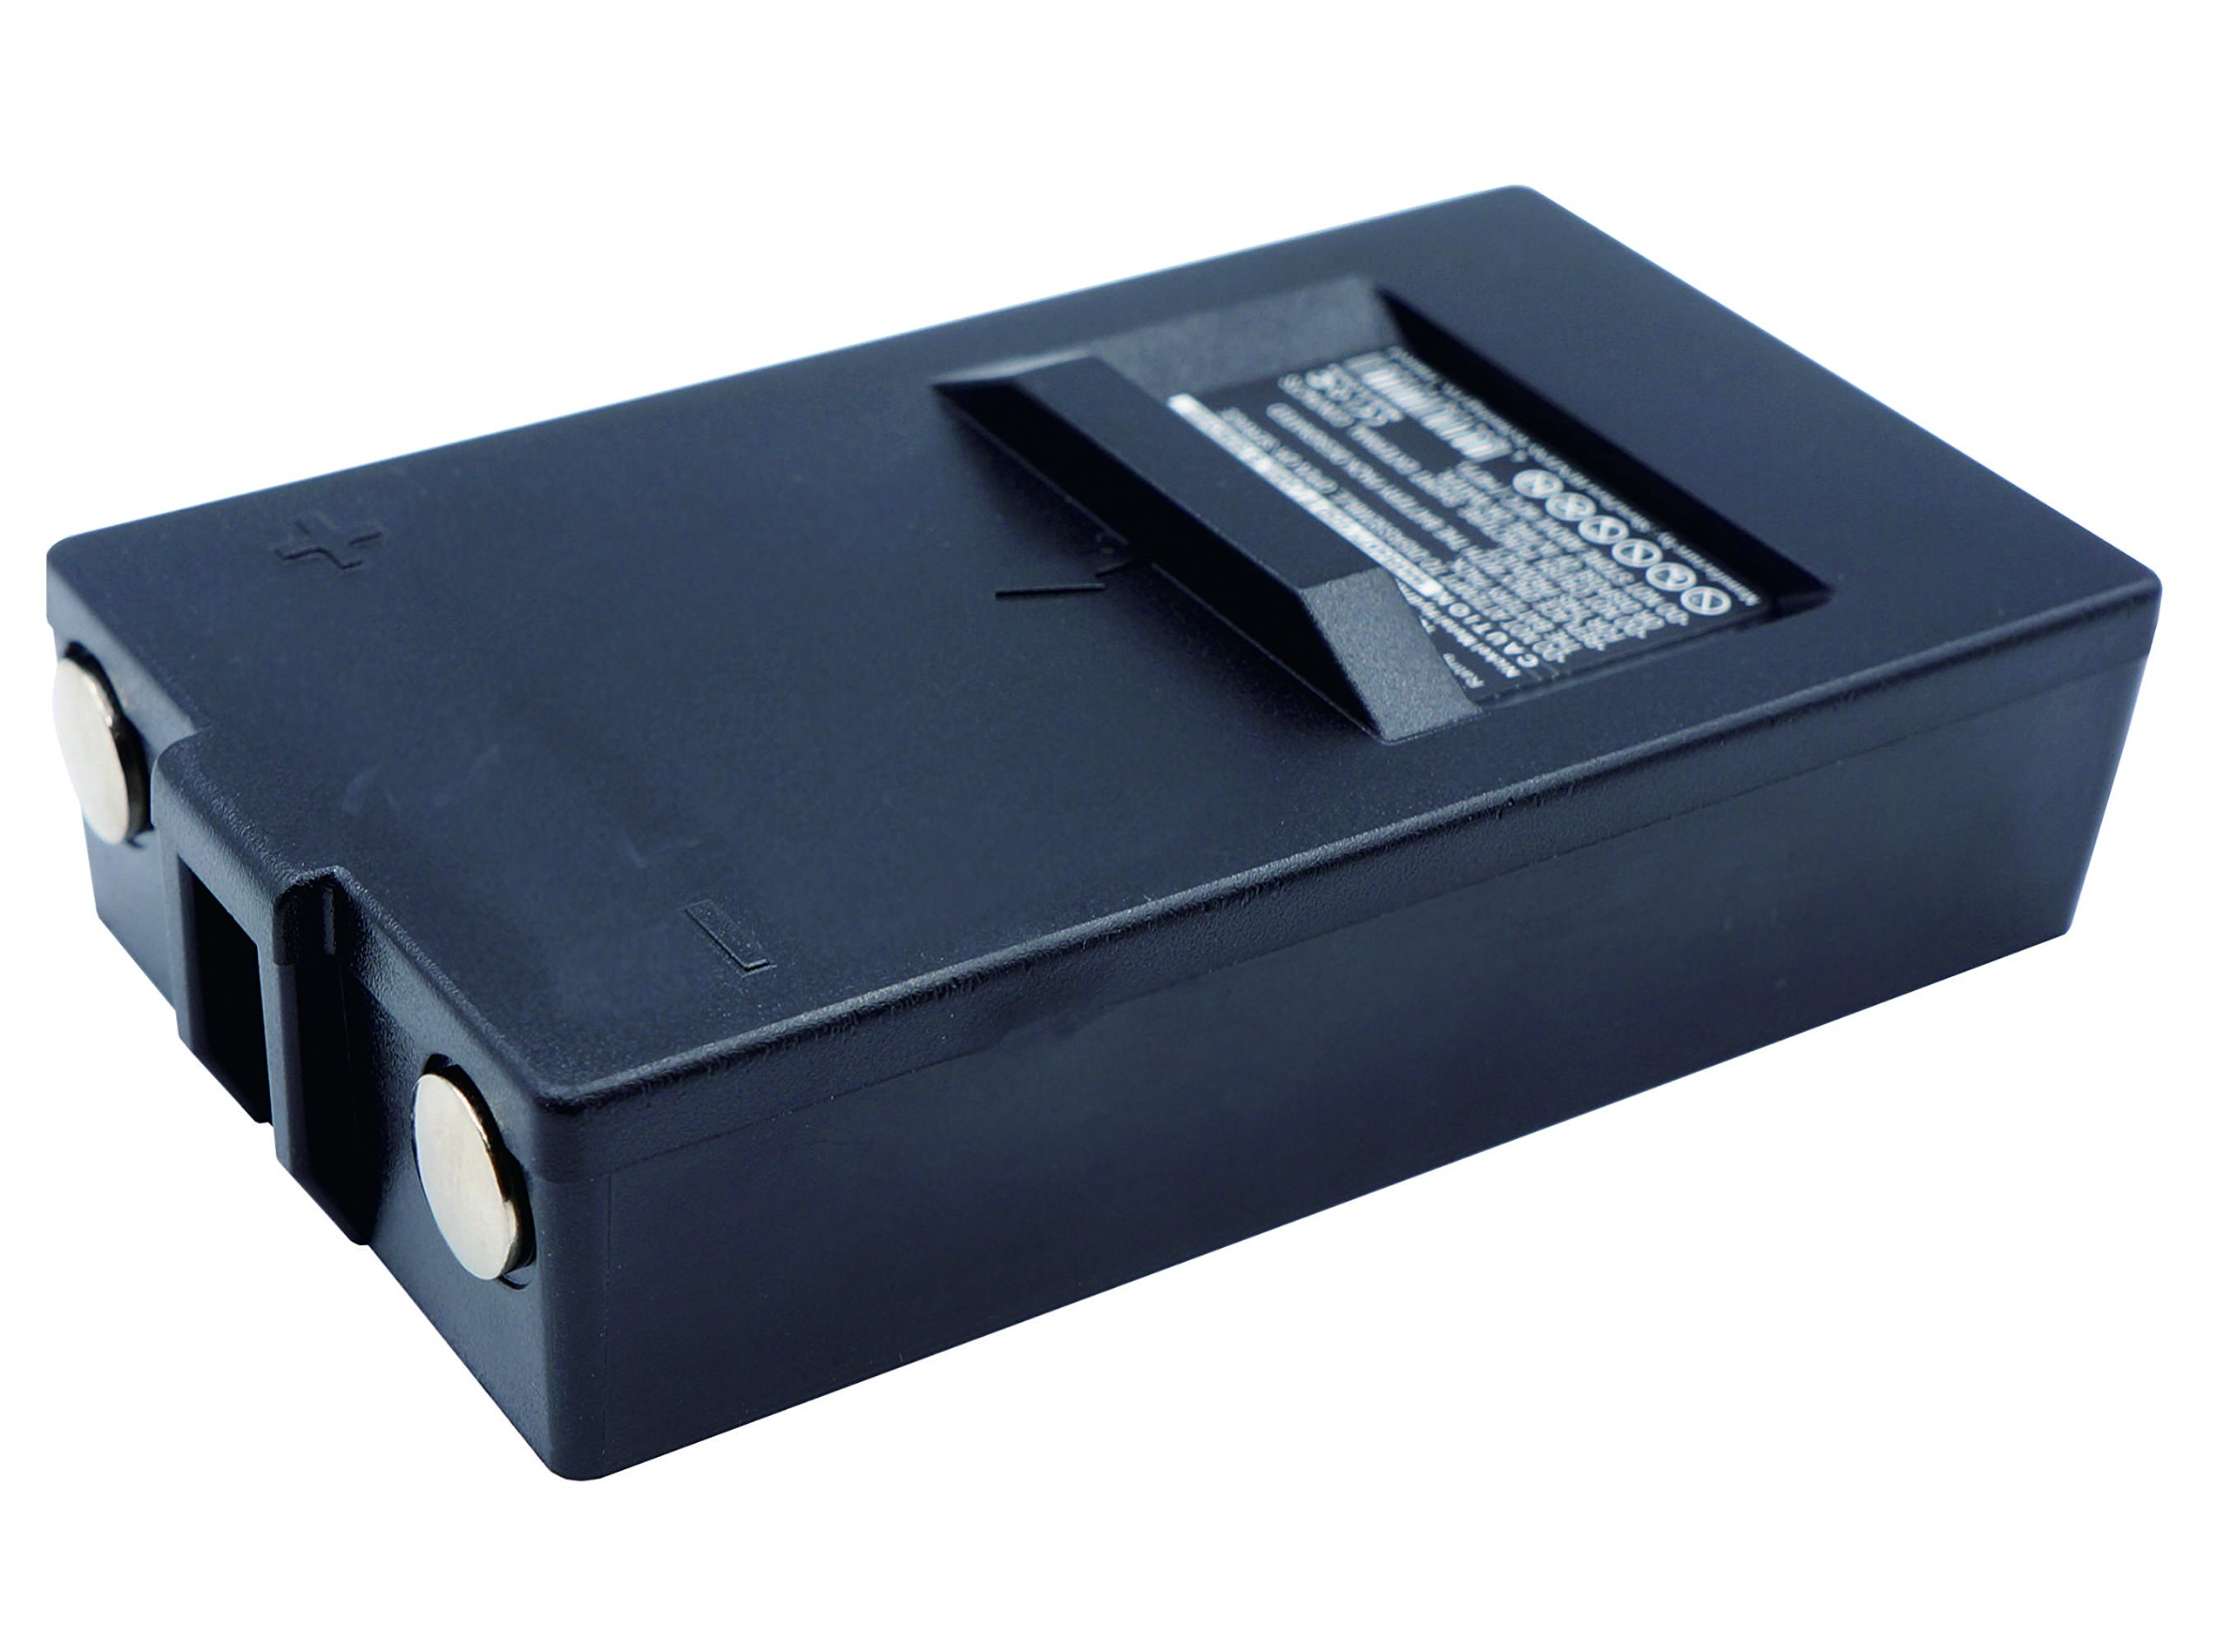 Cameron Sino Replacement Battery for Hiab 2055112, Combi Drive 5000, Dulevo 5000 Combi, Hi Drive 4000, Hi Drive 4000 ET